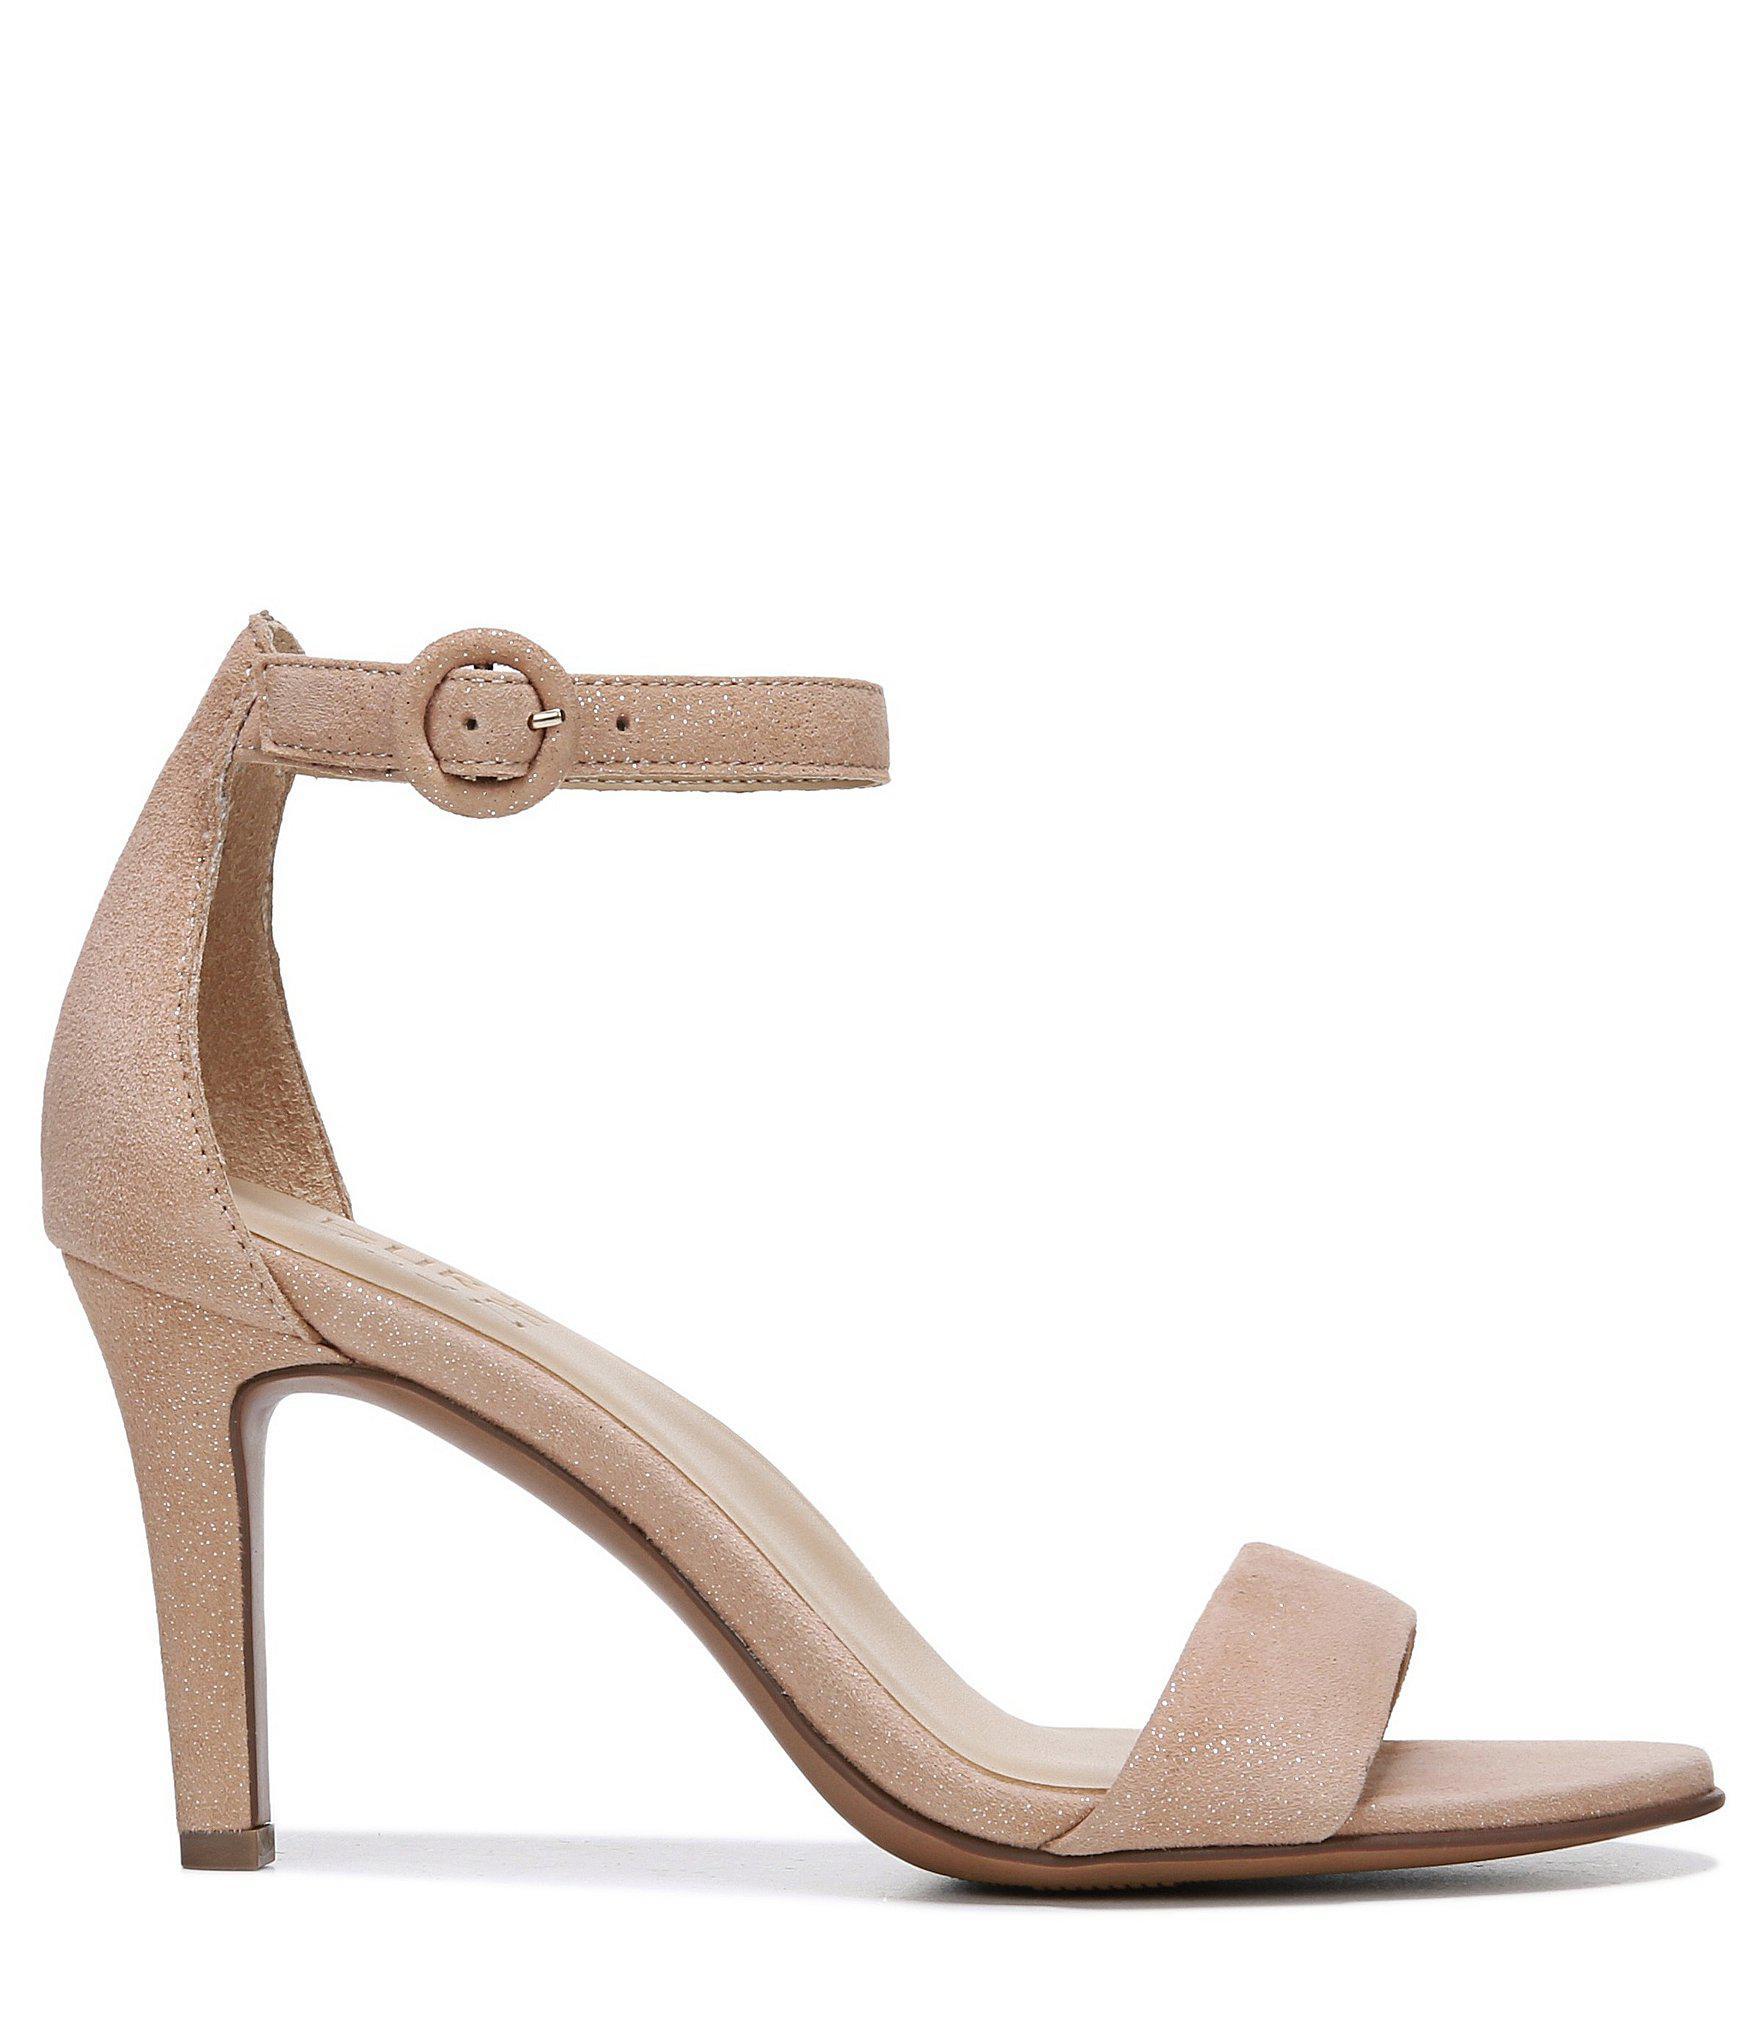 a9d2e20949d0 Naturalizer - Multicolor Kinsley Suede Ankle Strap Dress Sandals - Lyst.  View fullscreen